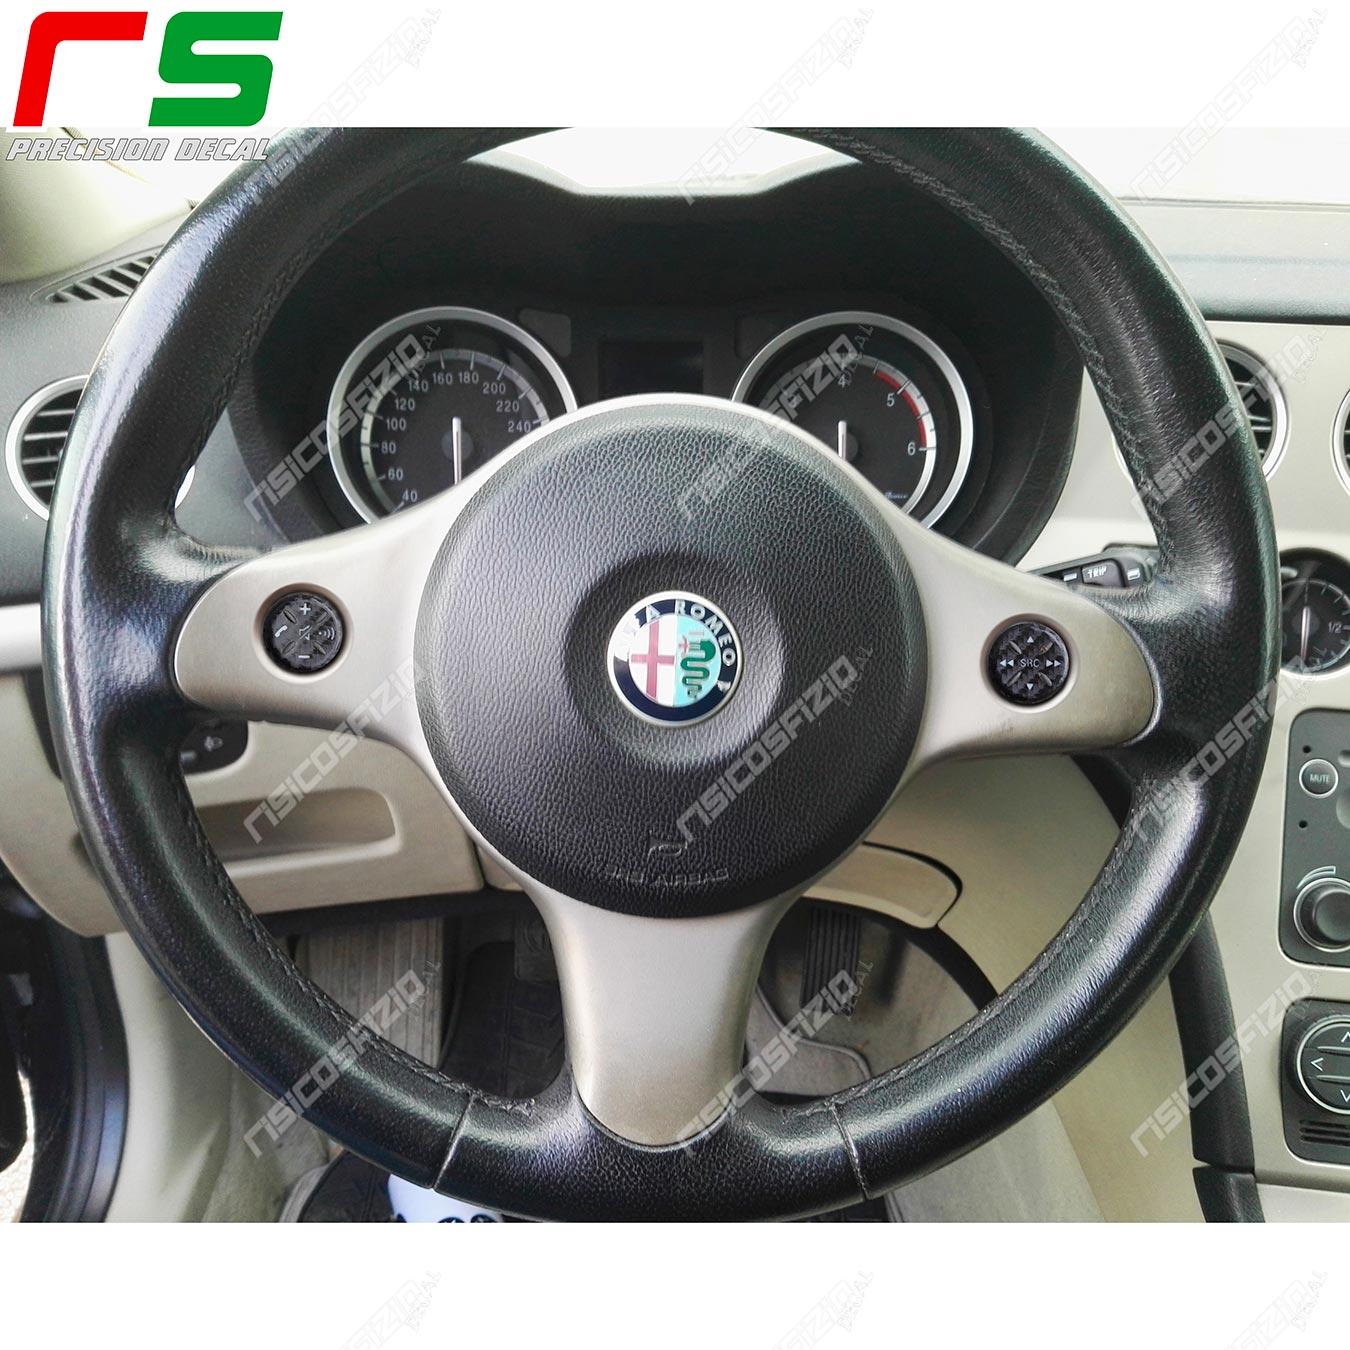 stickers Alfa Romeo 159 carbonlook Decal steering wheel controls